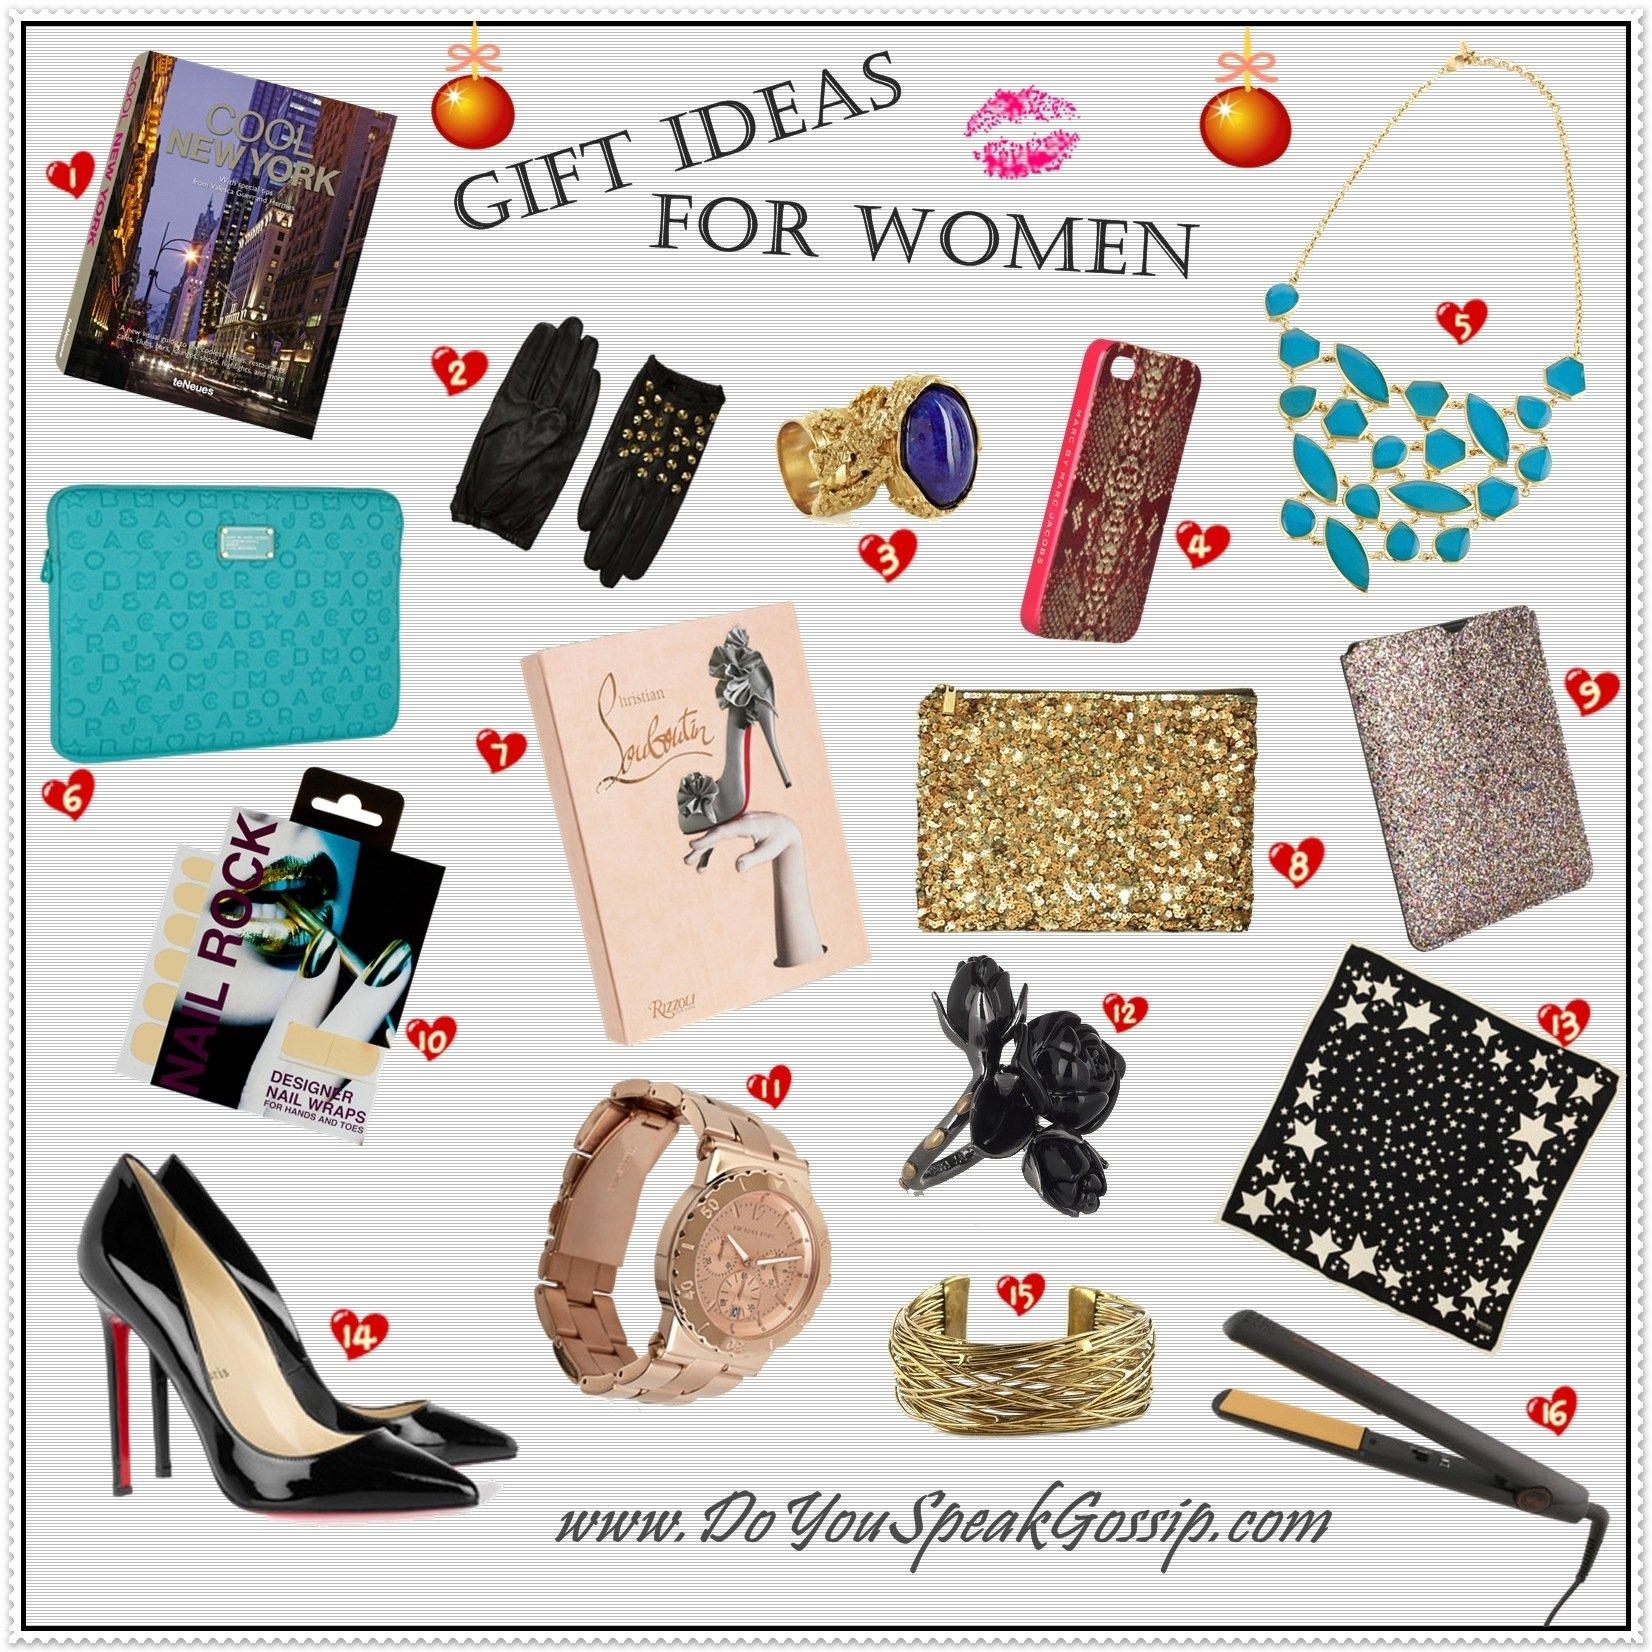 10 Wonderful Birthday Present Ideas For Her gift ideas for women do you speak gossipdo you speak gossip 2020